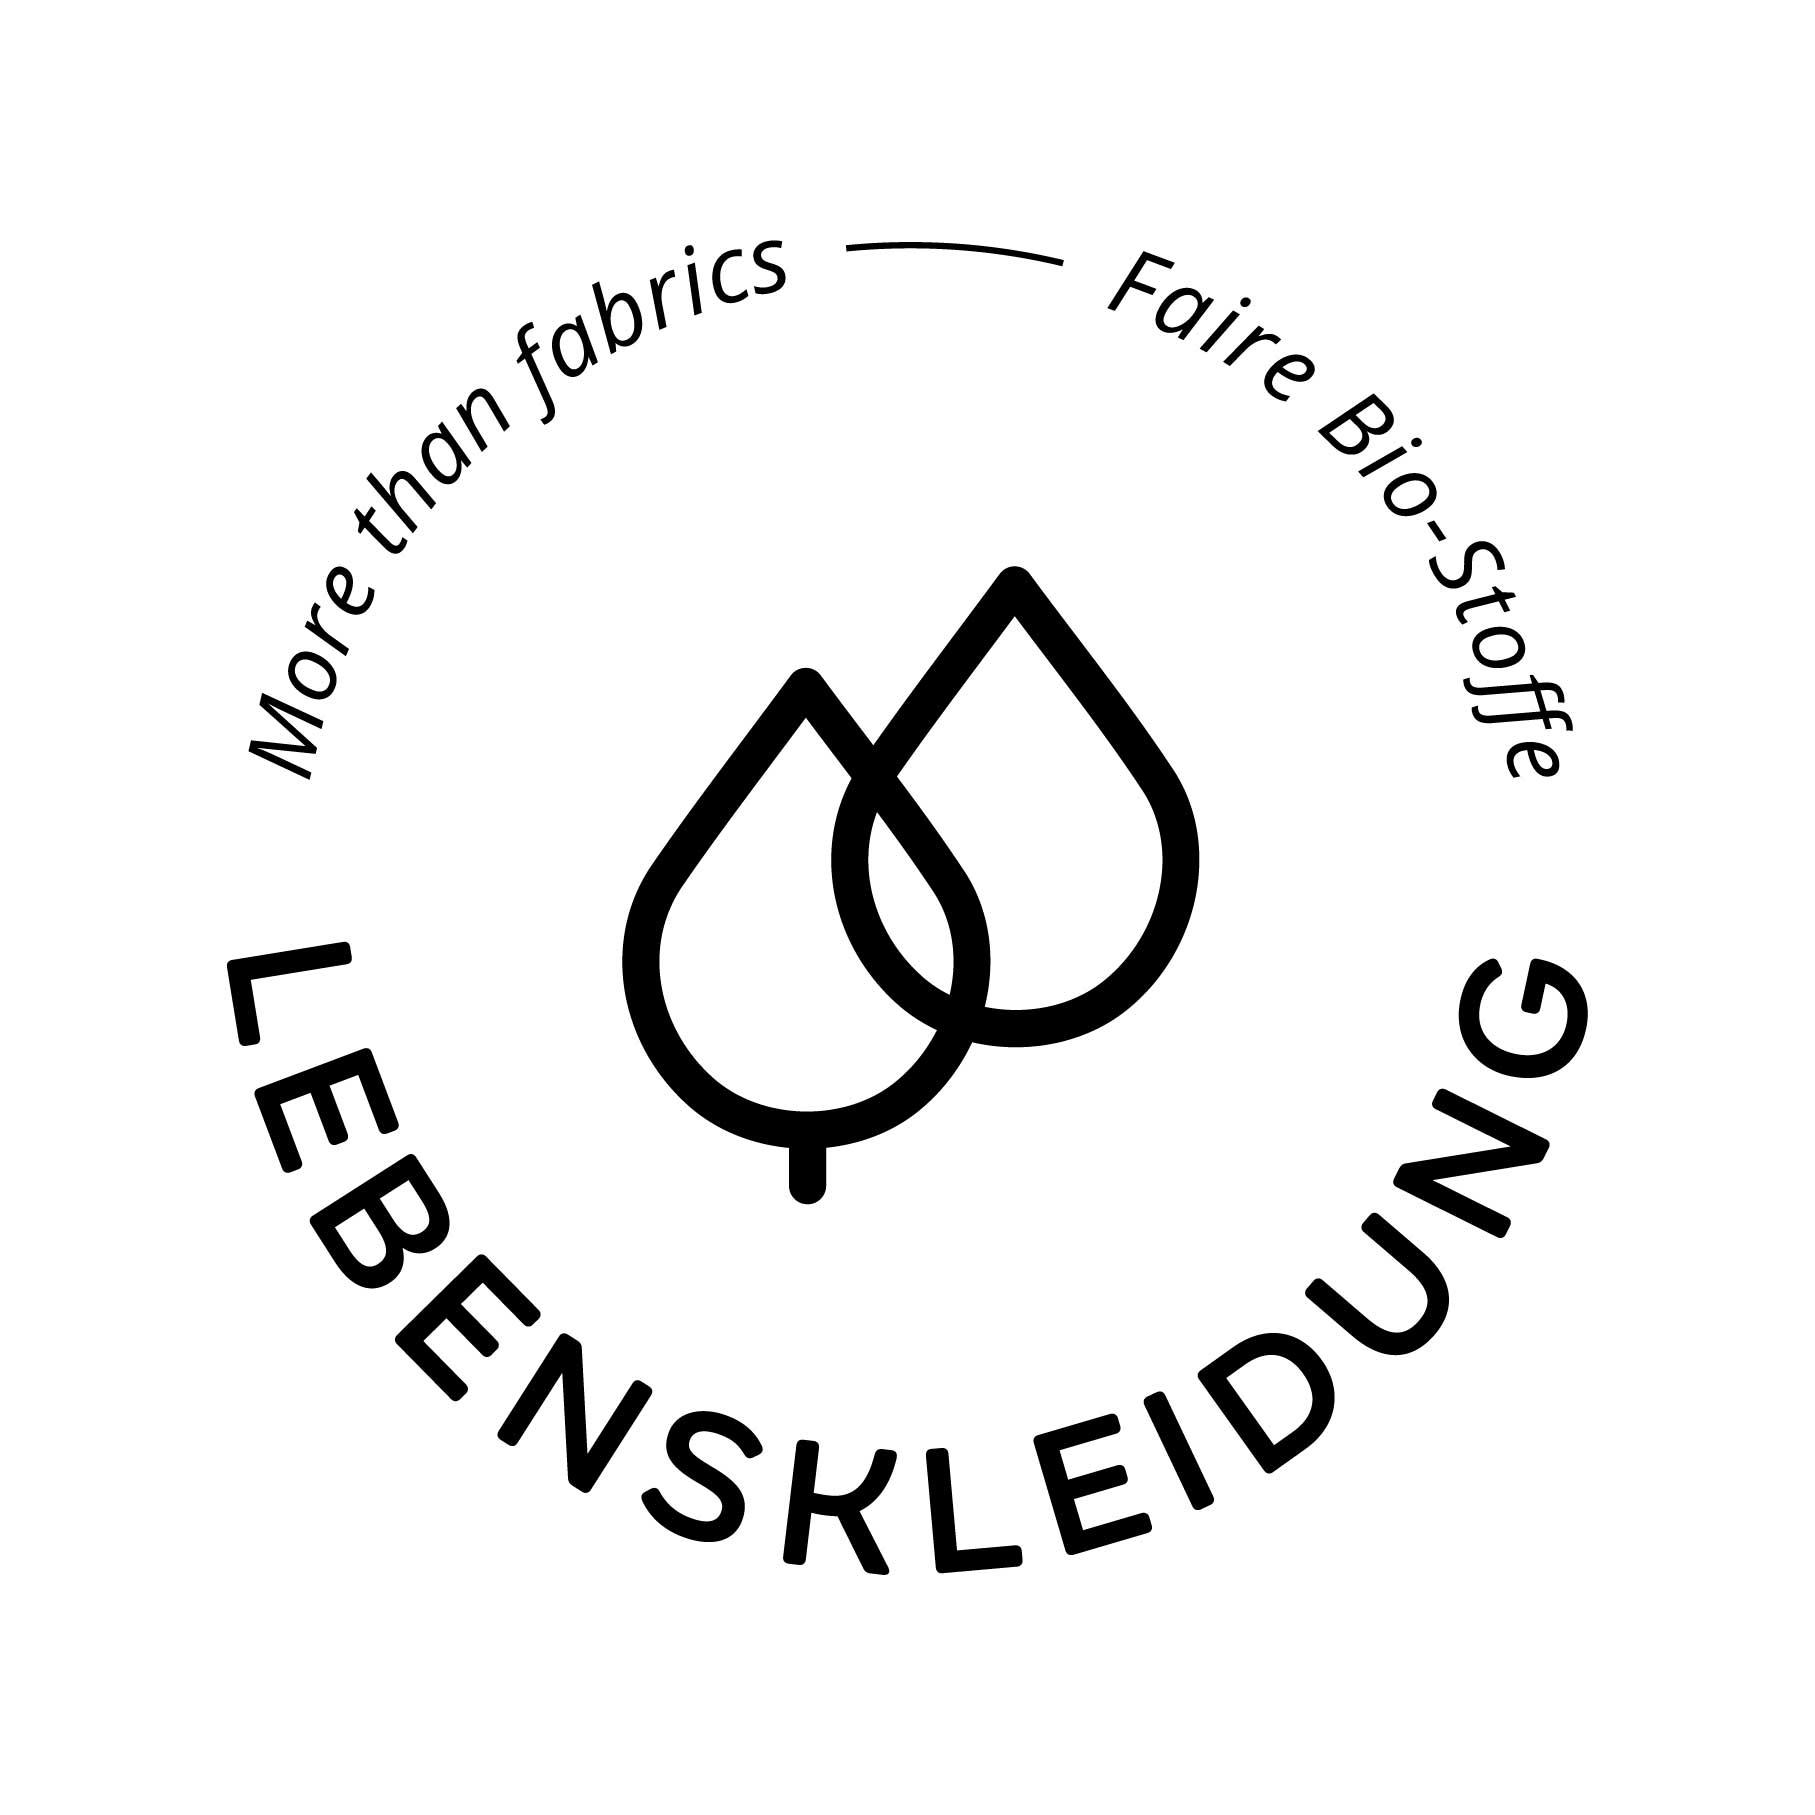 Tela orgánica RIB 2x1 (Puños) - Henna